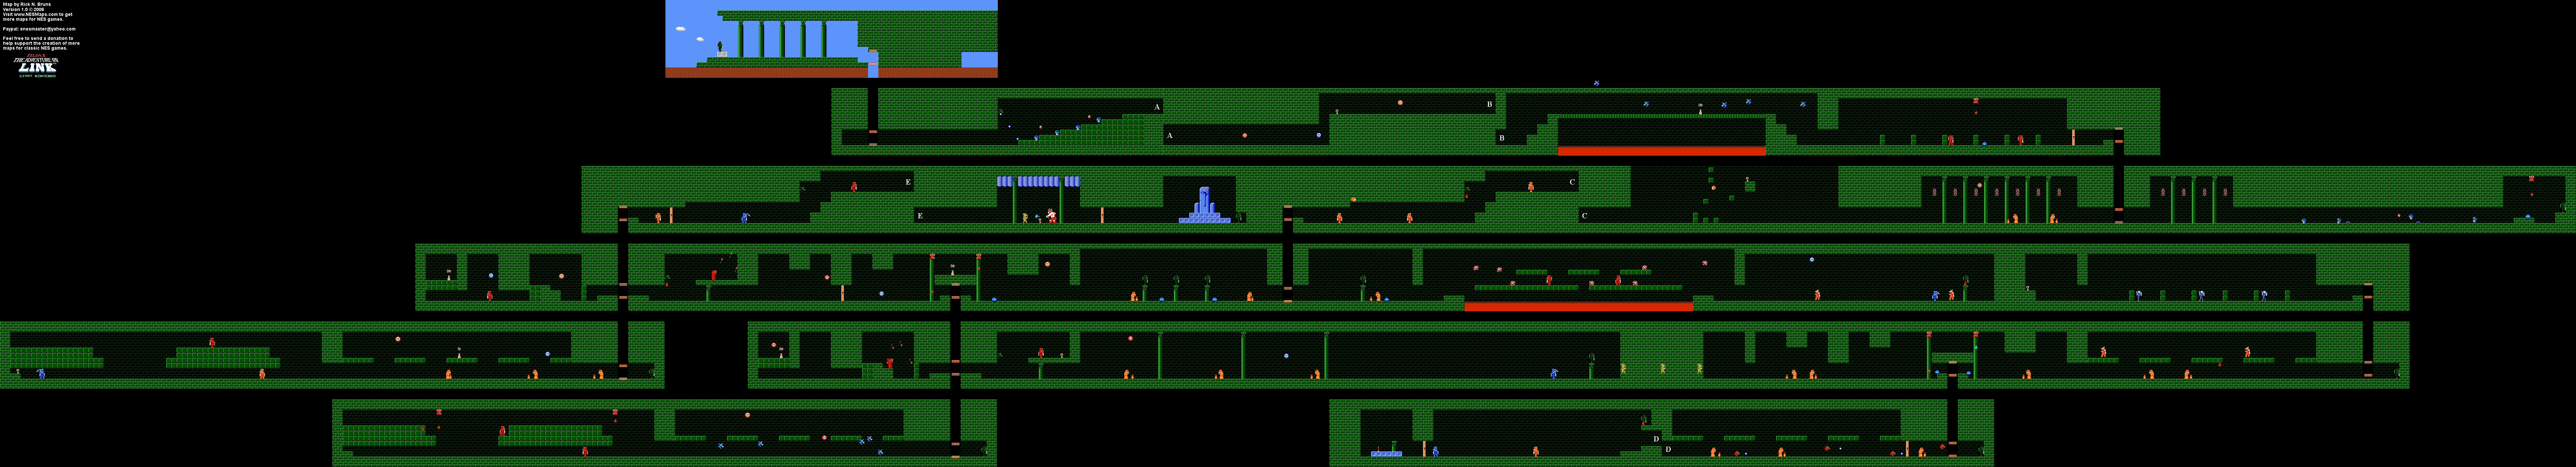 Zelda II - Palace on the Sea (Level 5) Map [31]